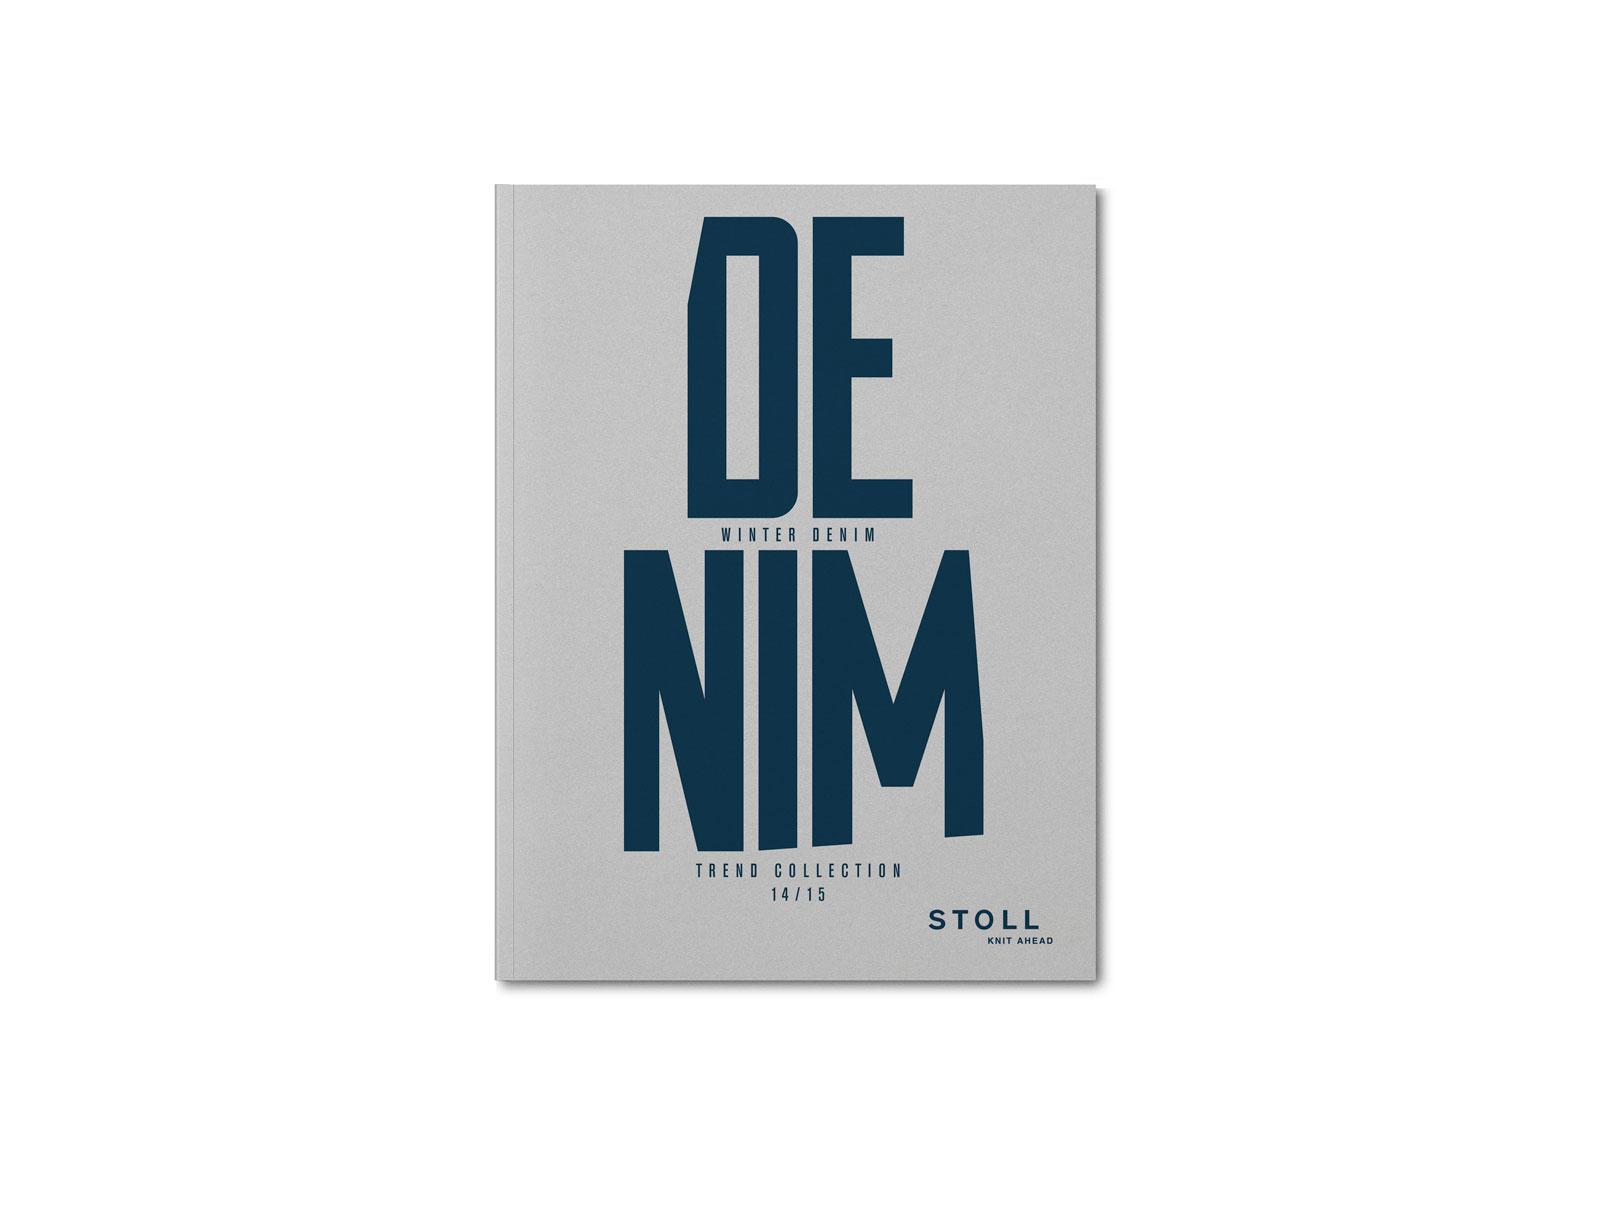 OLIVER MOORE Art Direction and Graphic Design  Idastrasse 17 13156 Berlin  studio@olivermoore.de +49 (0)30 40368971 STOLL Denim